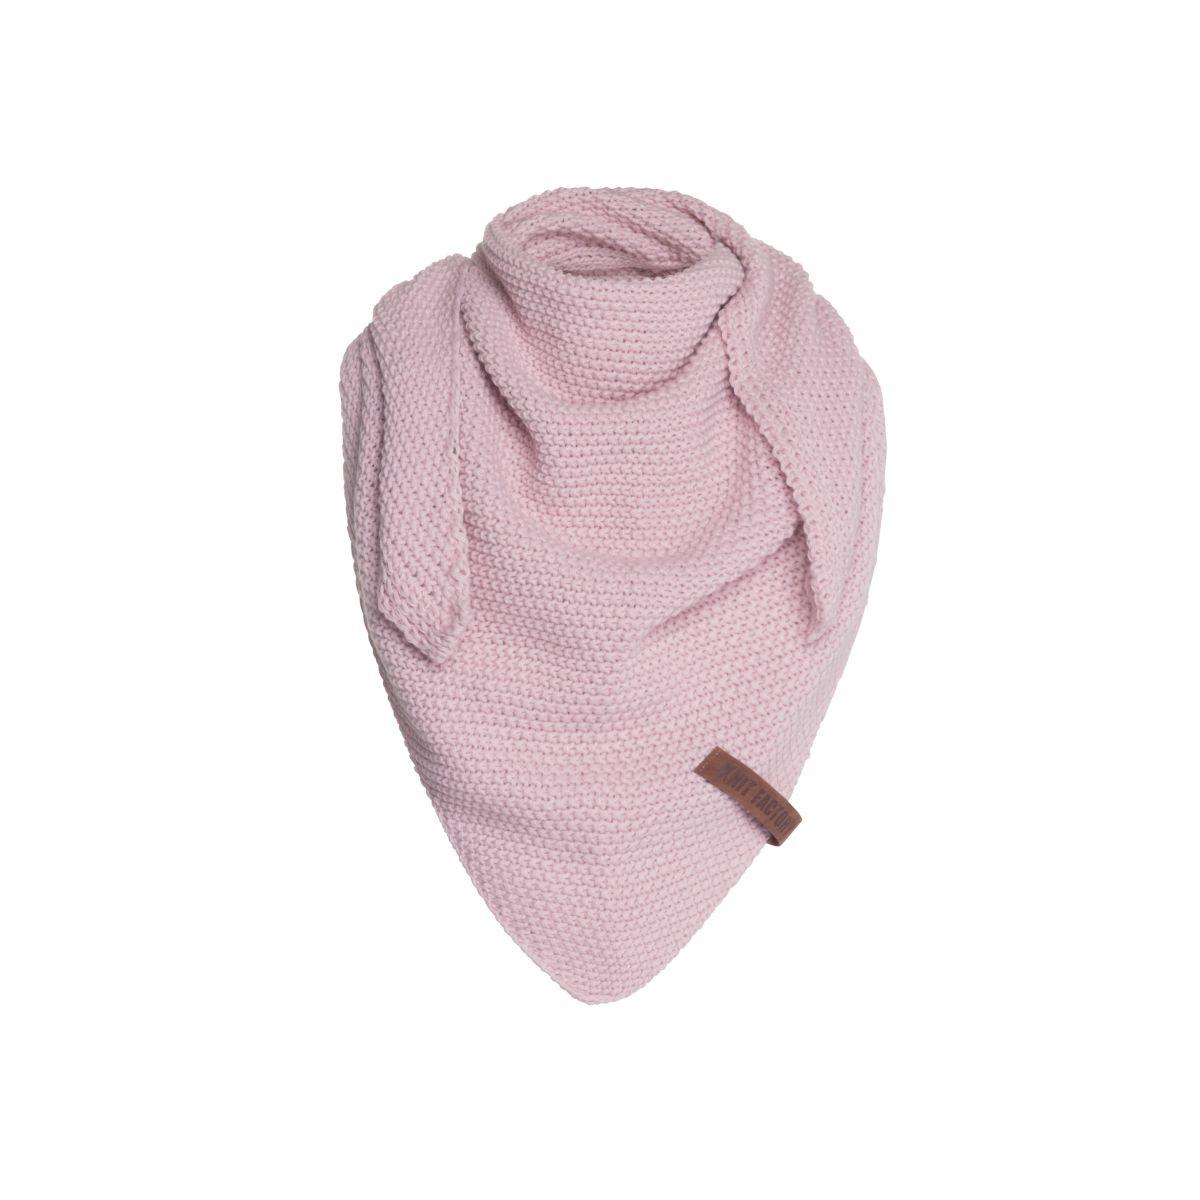 knit factory 1205921 coco omslagdoek junior roze 1